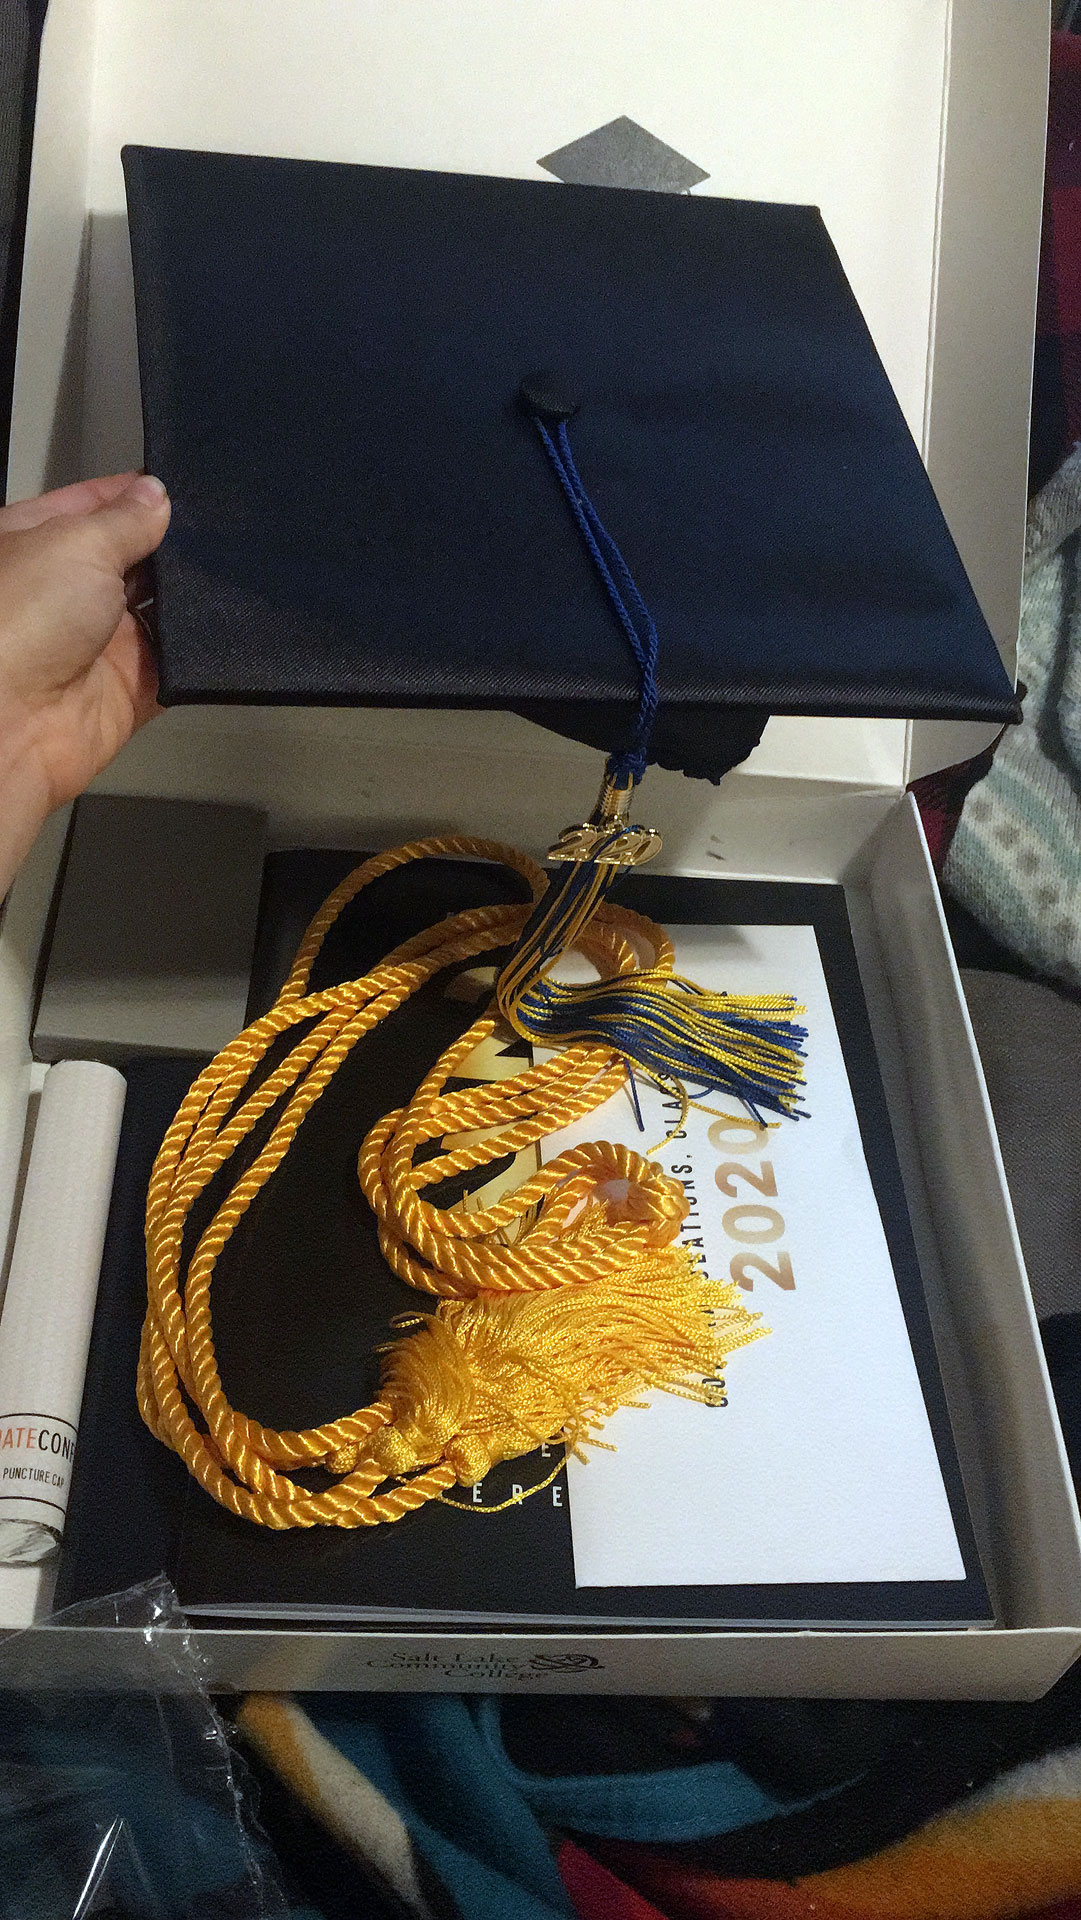 SLCC 2020 graduation package